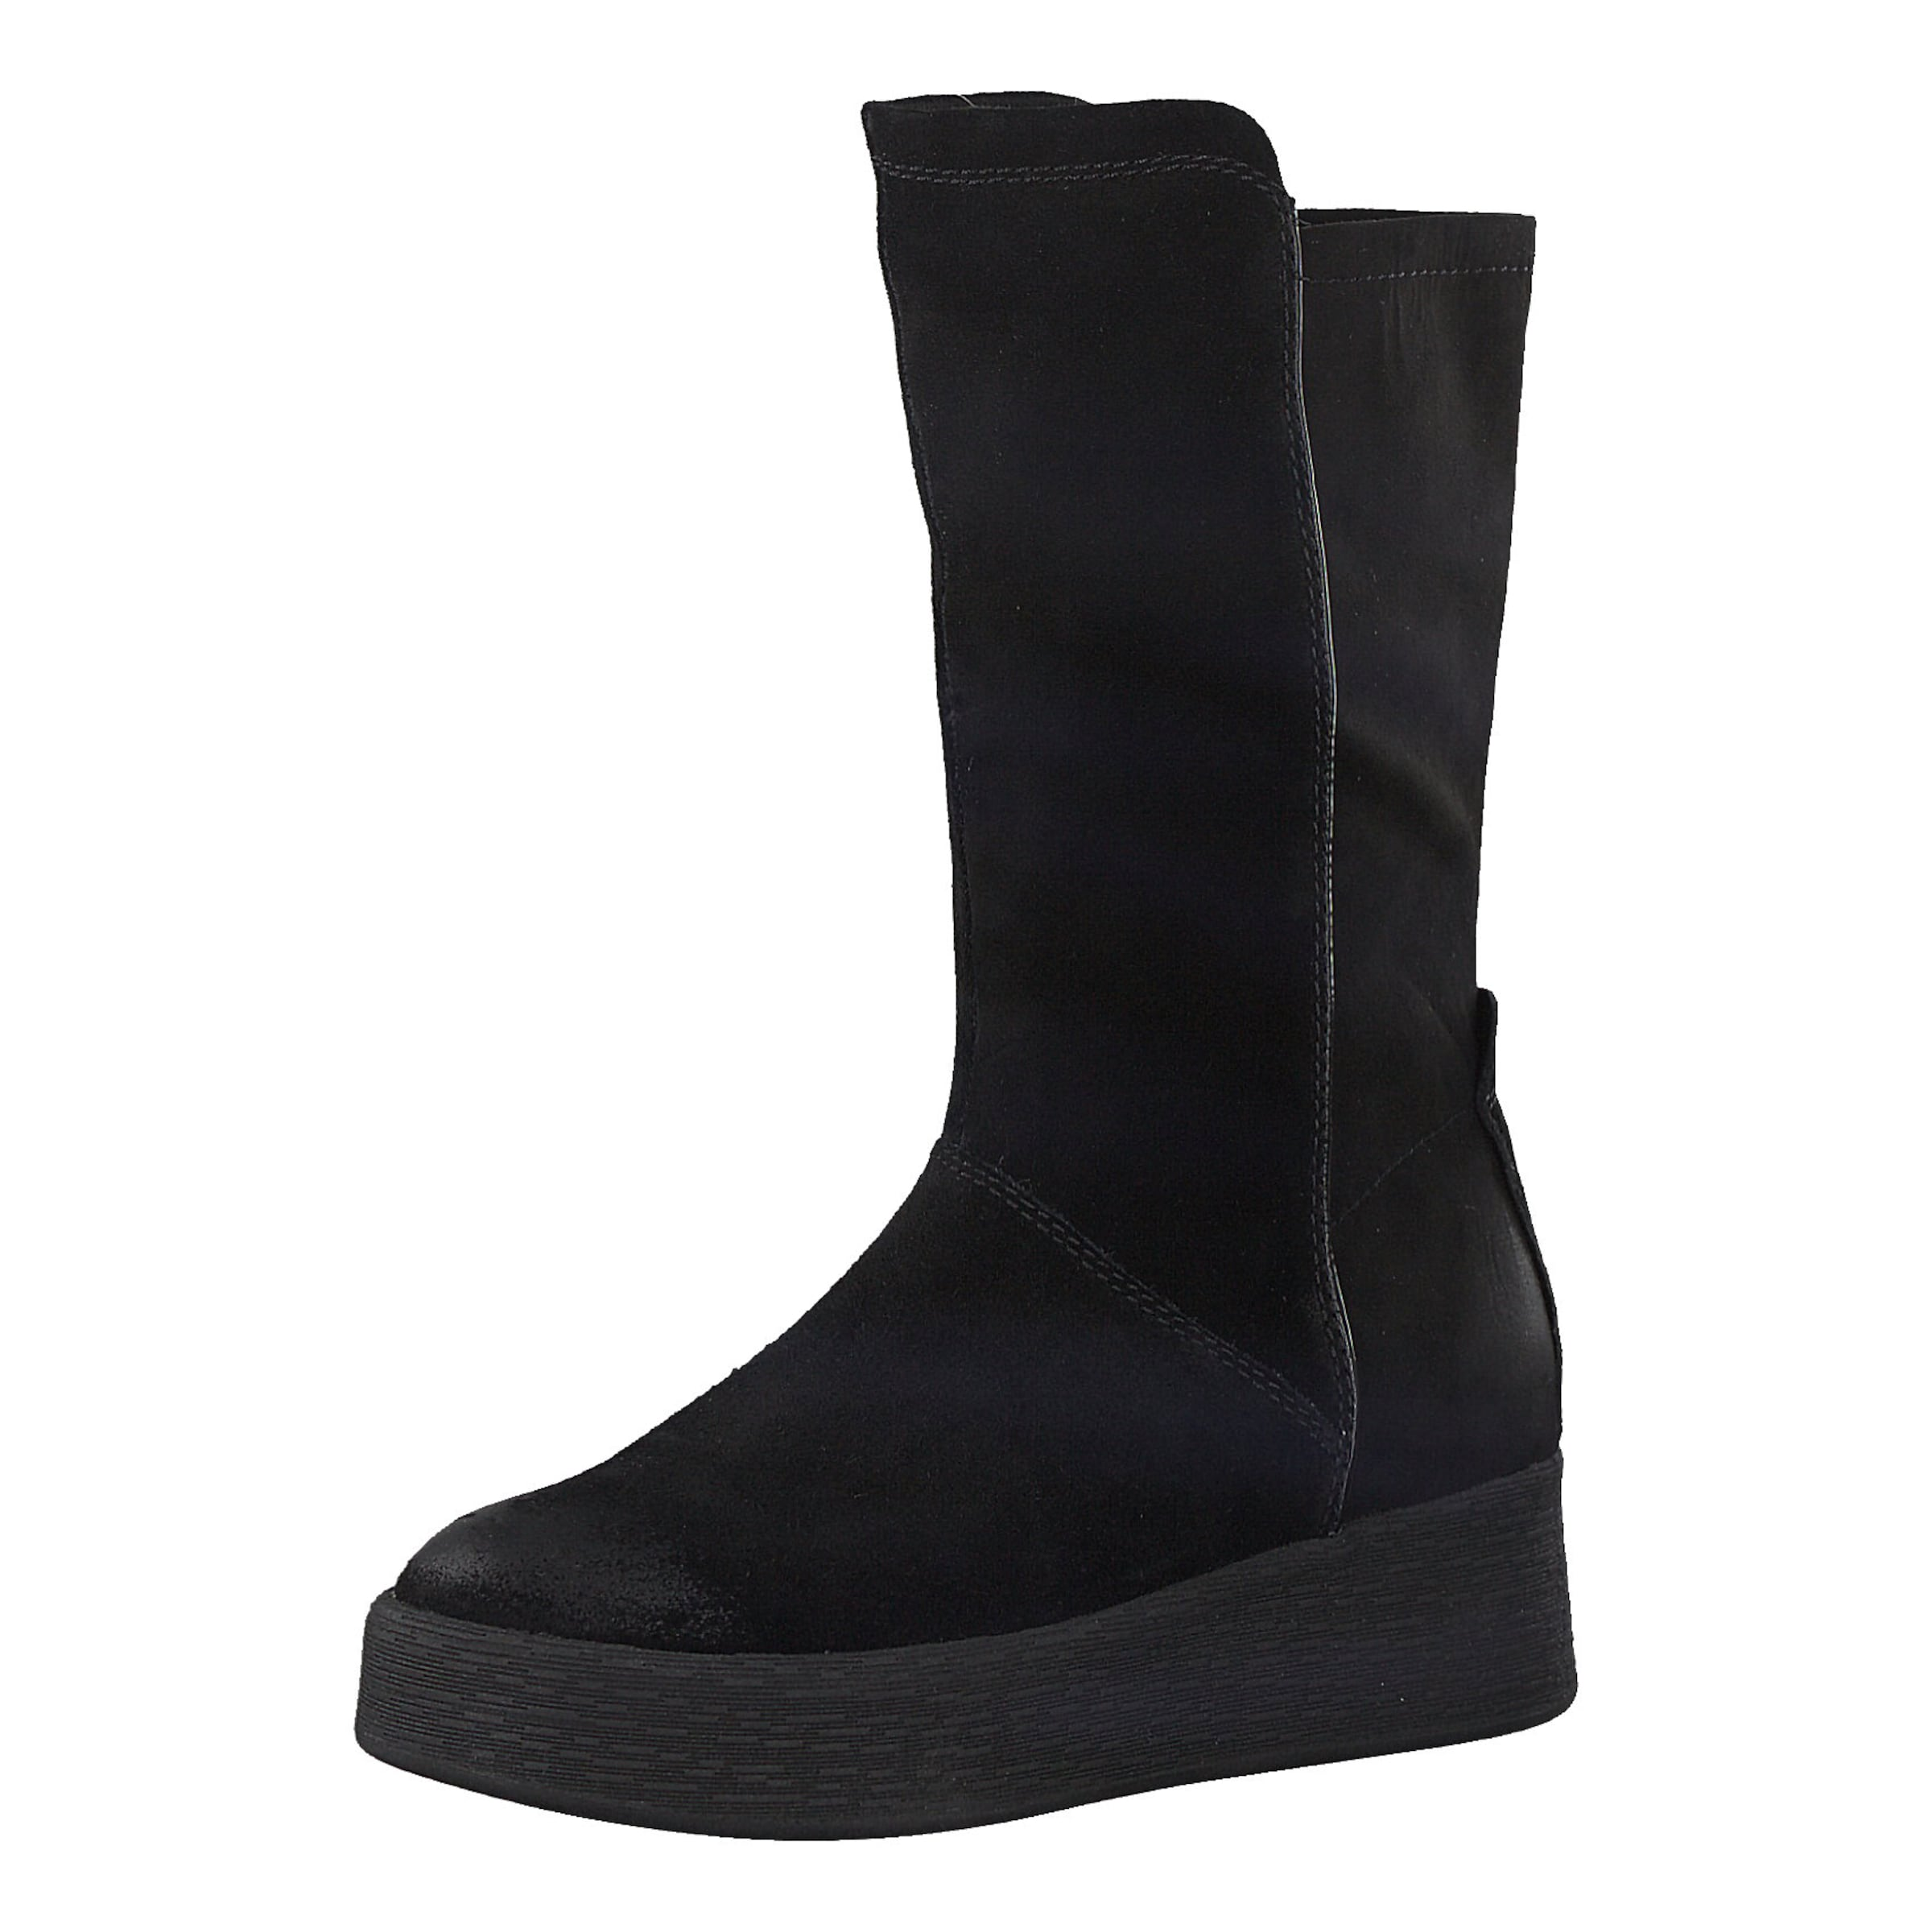 Haltbare Mode billige Schuhe TAMARIS | Stiefel Schuhe Gut getragene Schuhe